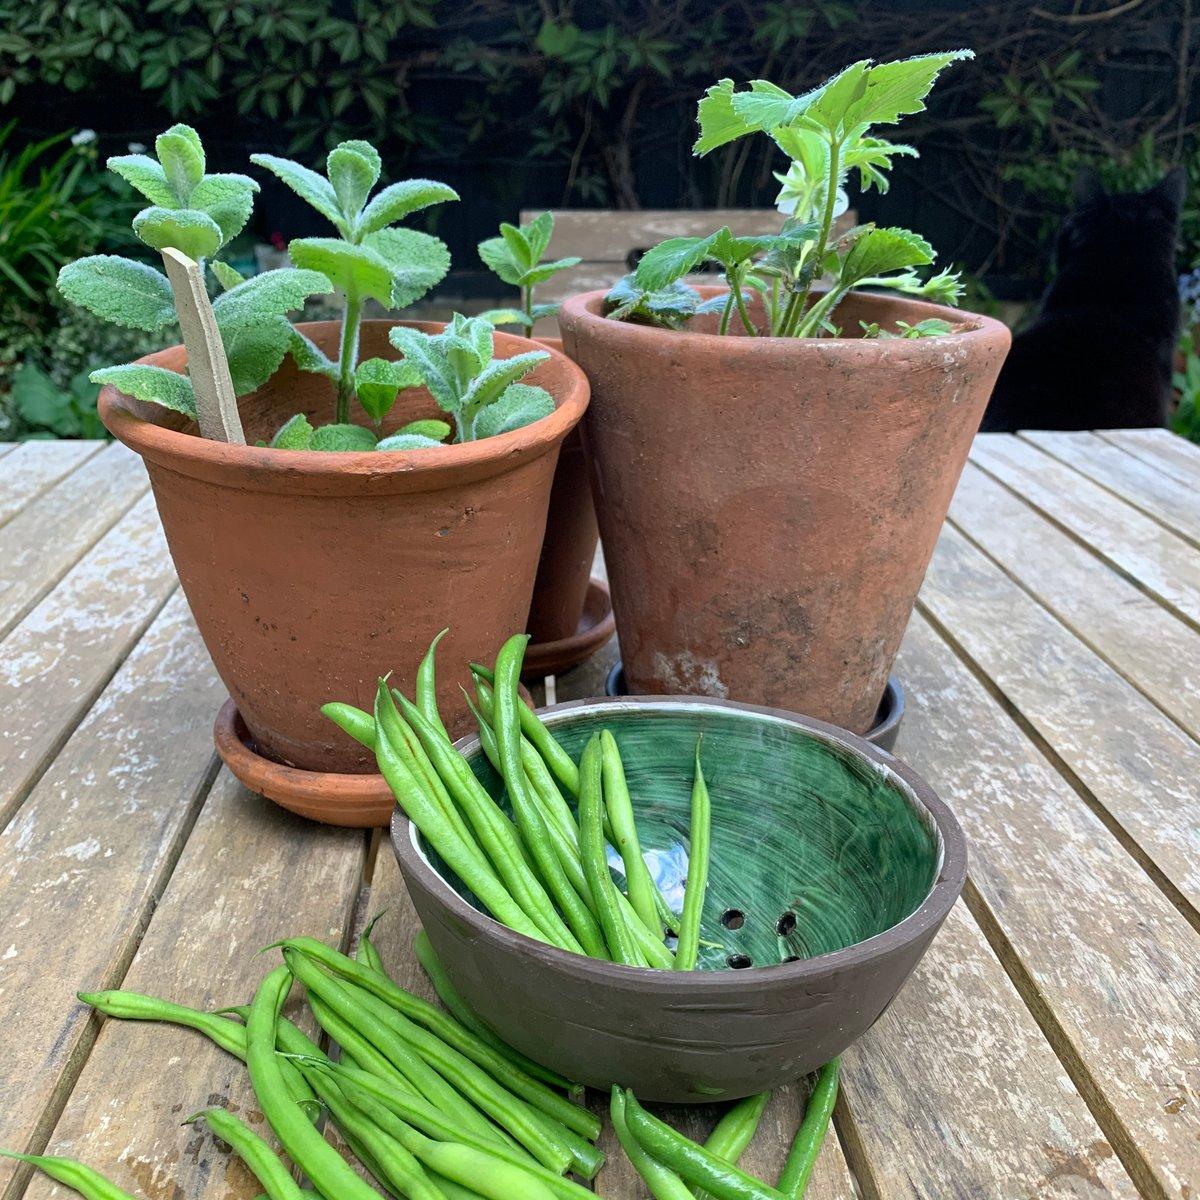 Draining bowl, greenwich green